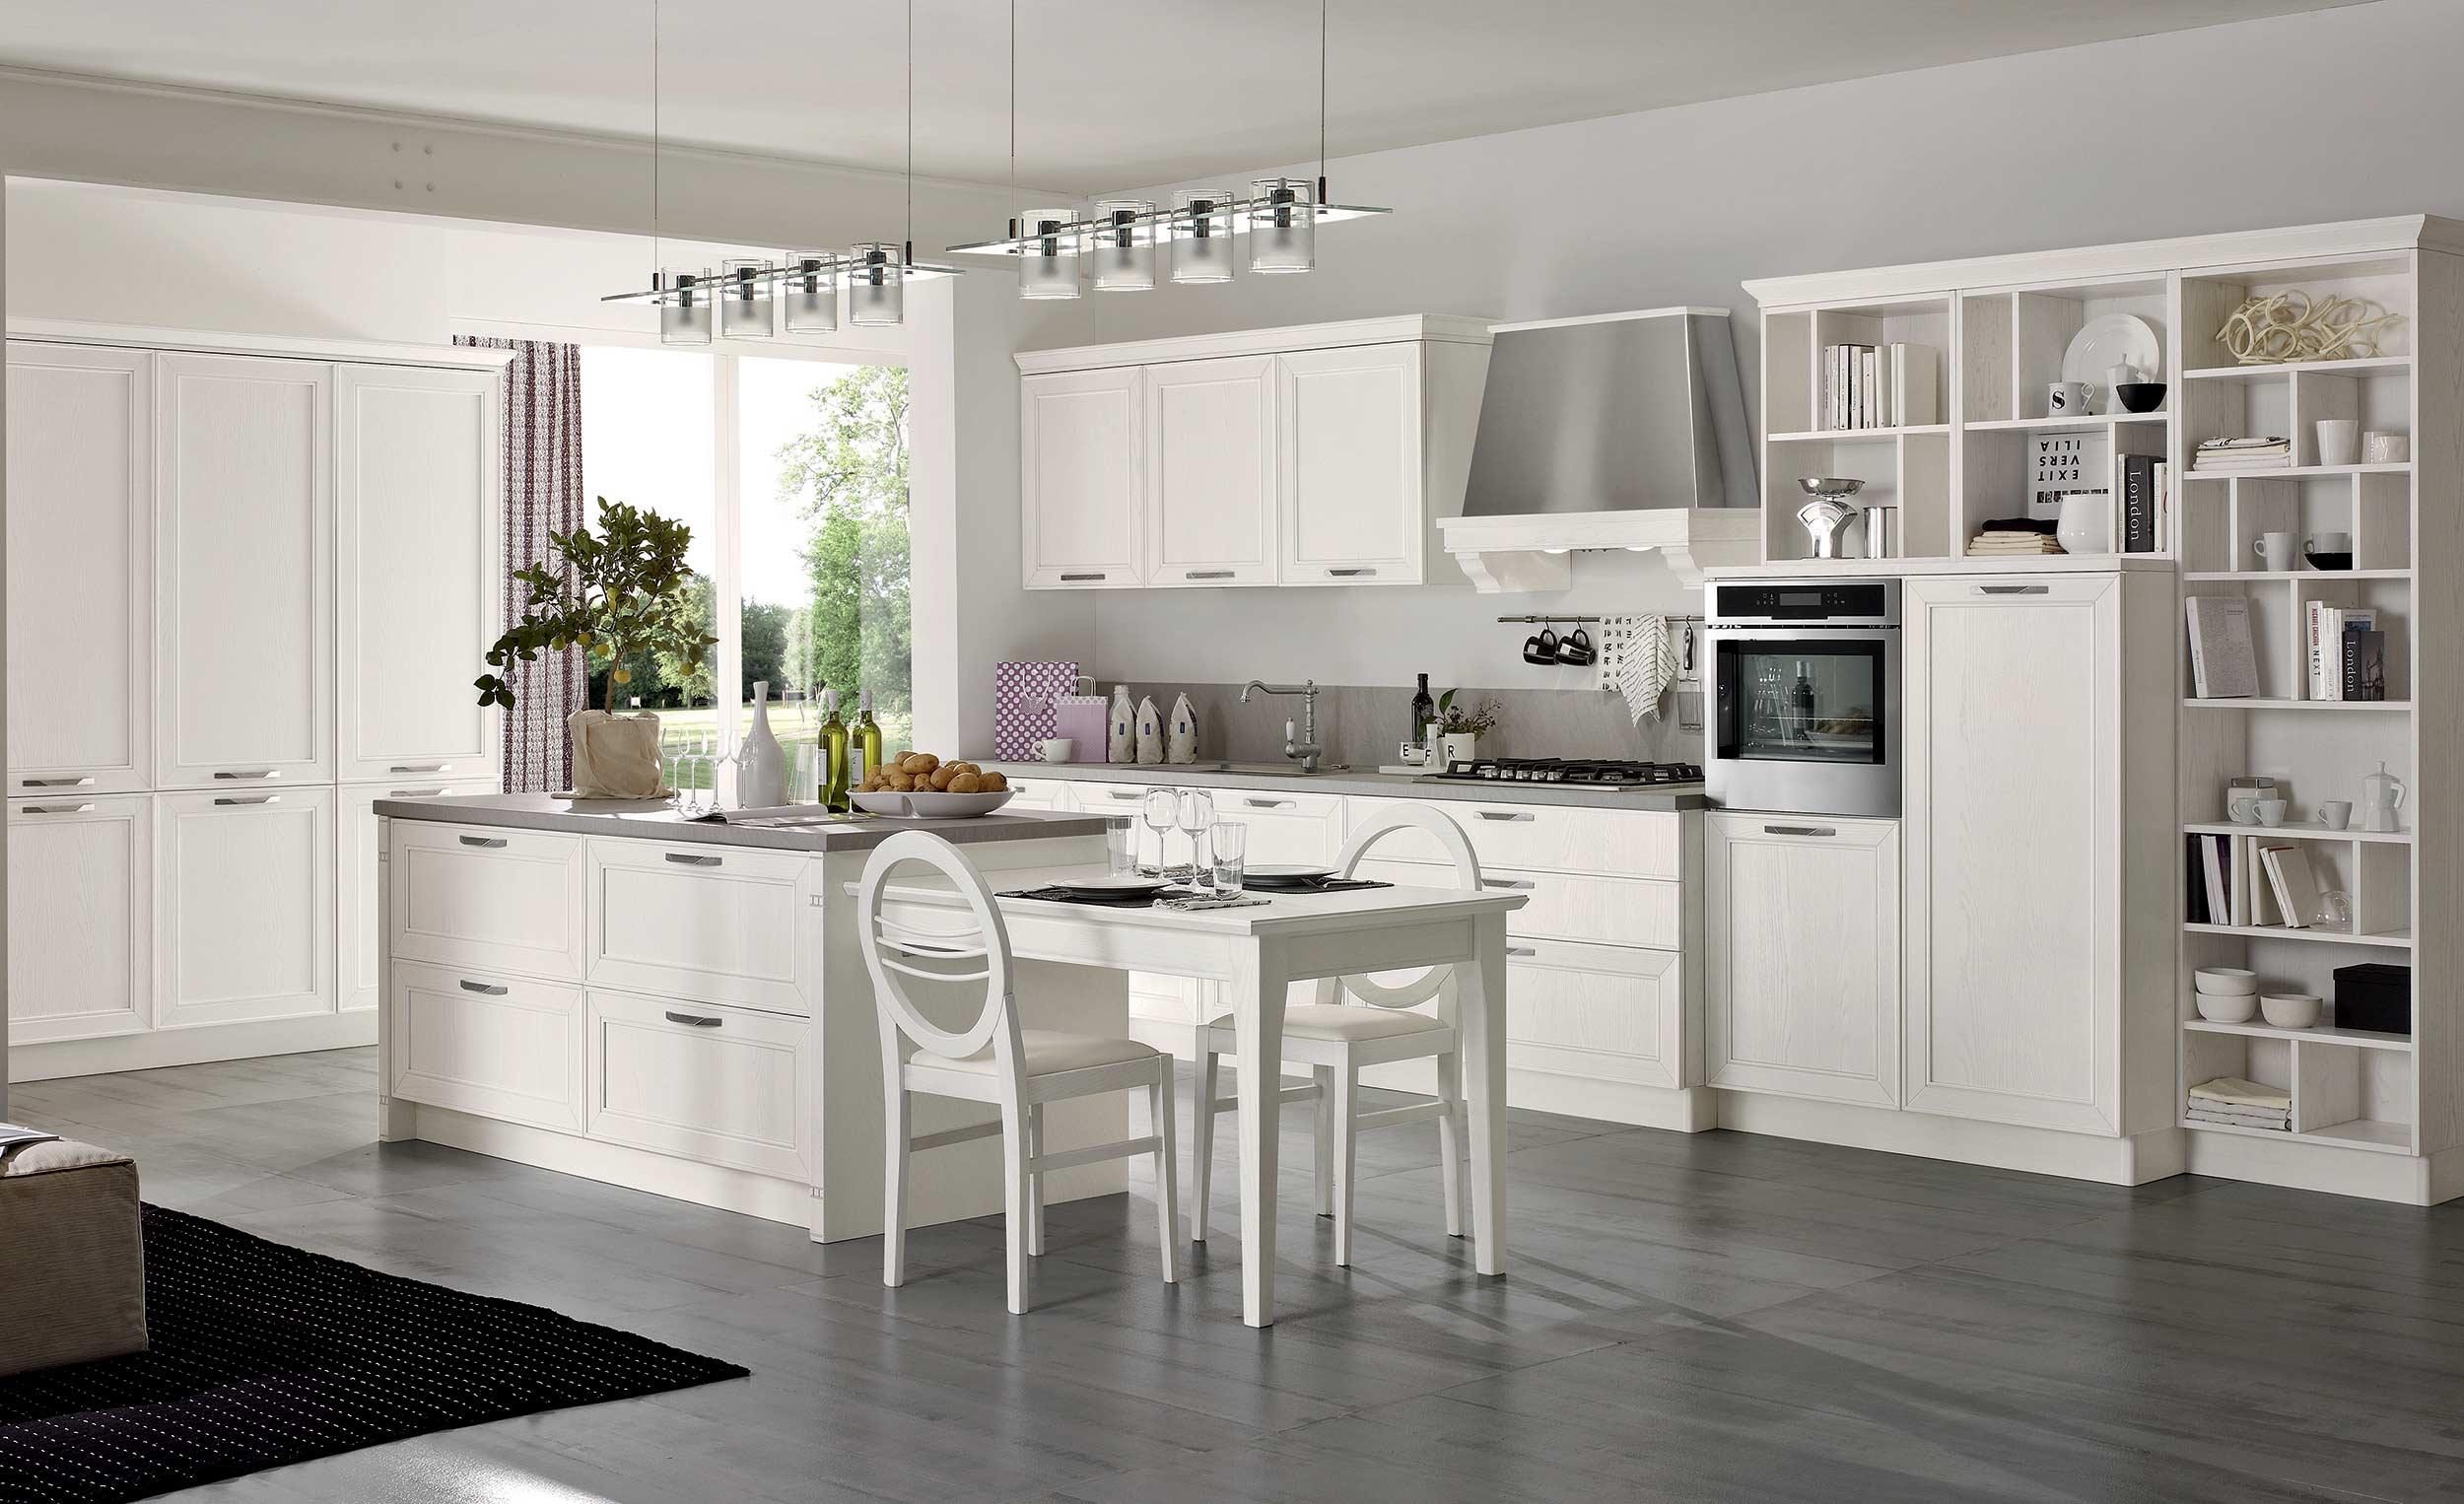 Stunning Cappa Per Cucina Componibile Gallery - Design & Ideas ...